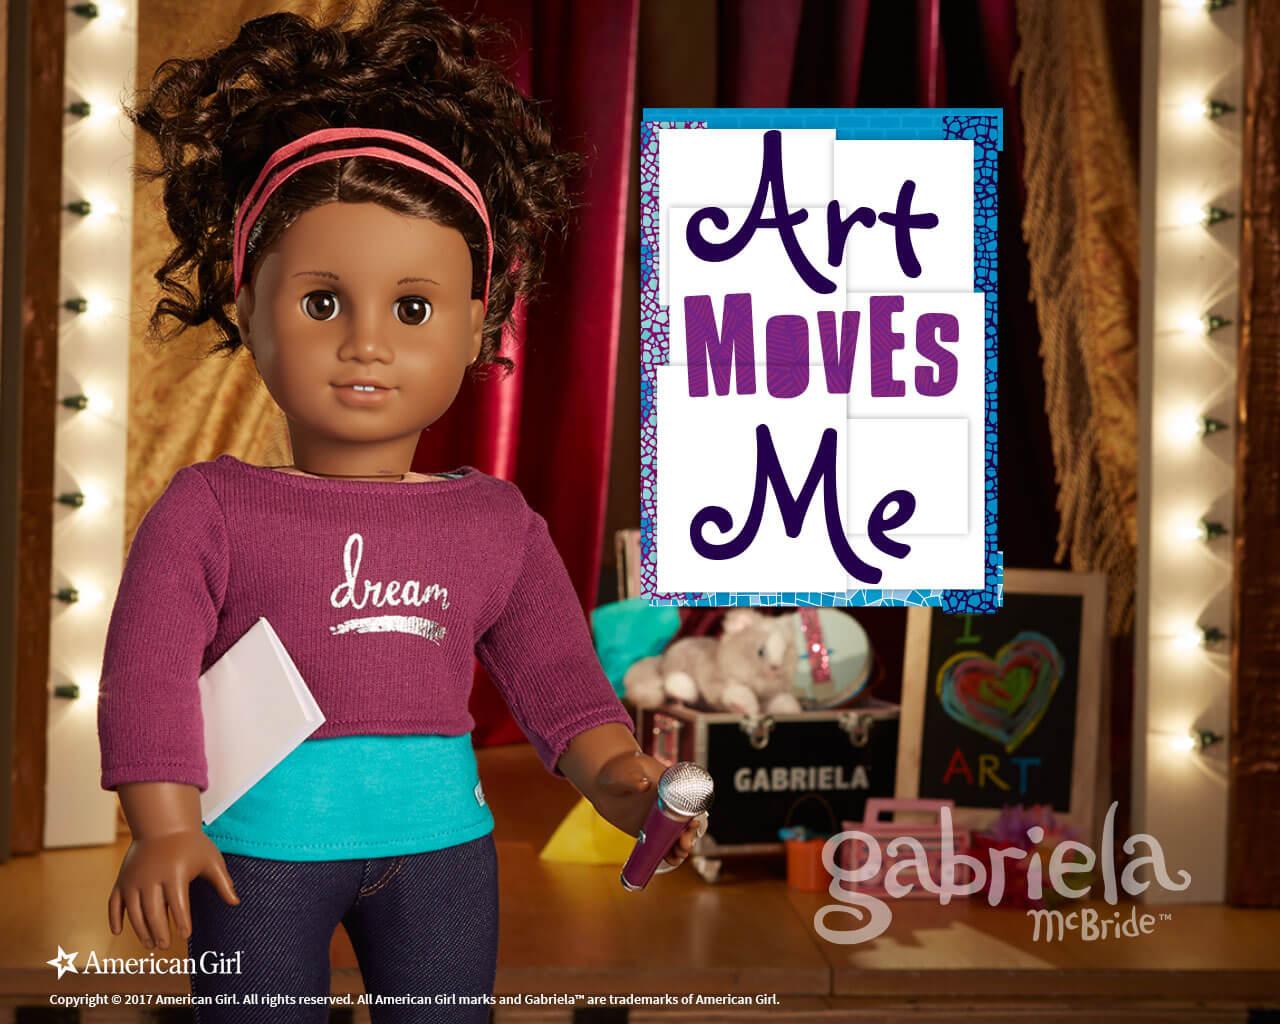 Gabriela McBride 2017 Girl of the Year Play American Girl 1280x1024